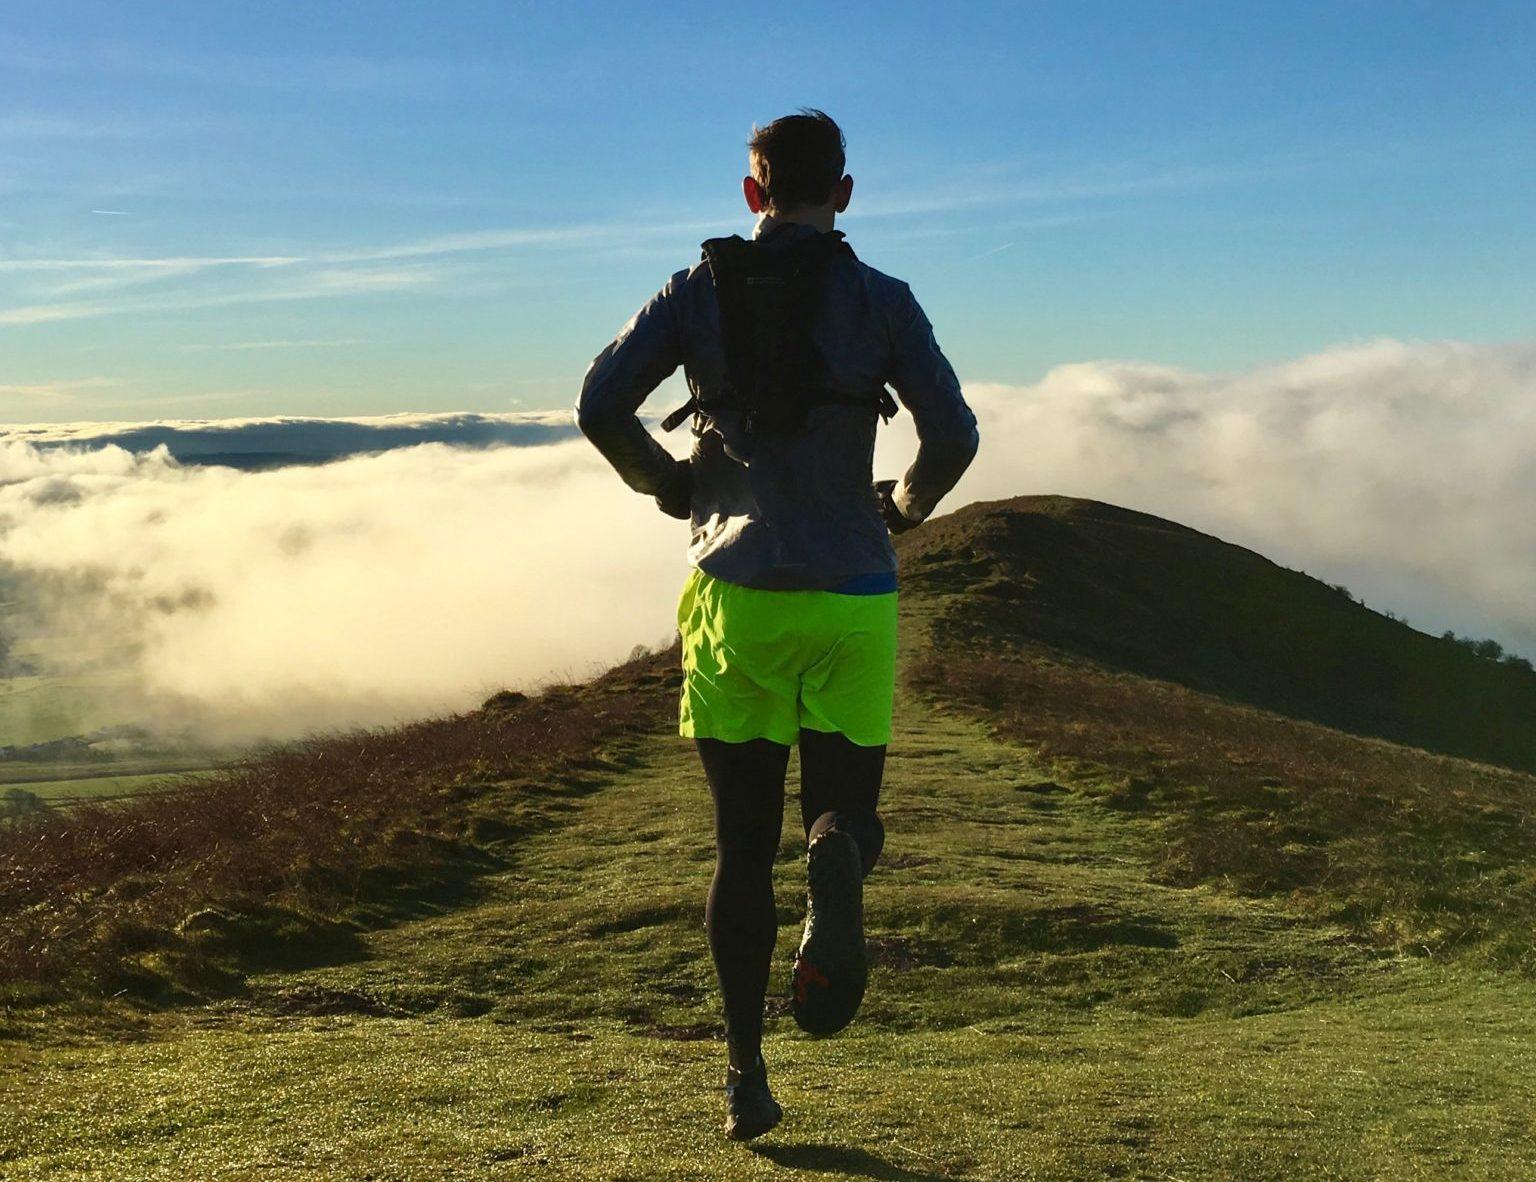 TOP RUNNING TIPS | 6 DOWNHILL RUNNING TECHNIQUES